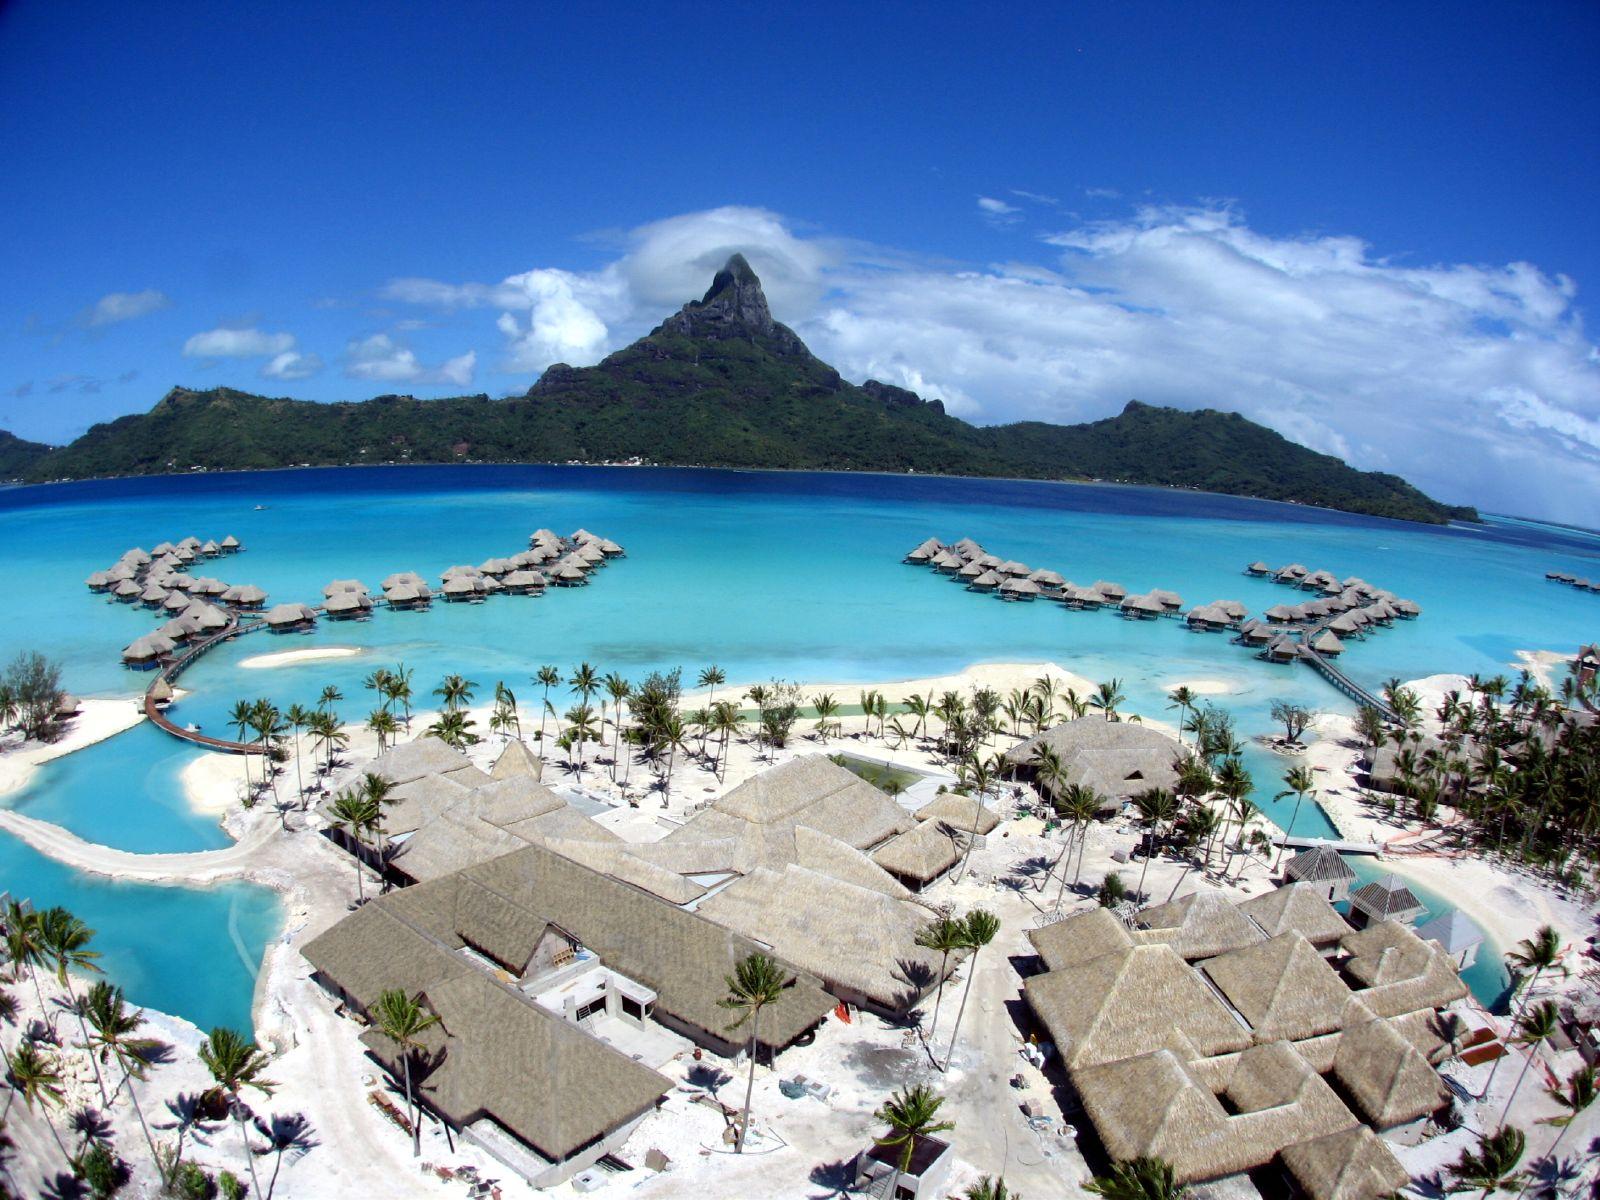 http://4.bp.blogspot.com/__5oFE11MvK8/TAeB6hC8XcI/AAAAAAAAFd4/sJ3Ce1KiJbc/s1600/Bora_Bora_French_Polynesia4.jpg